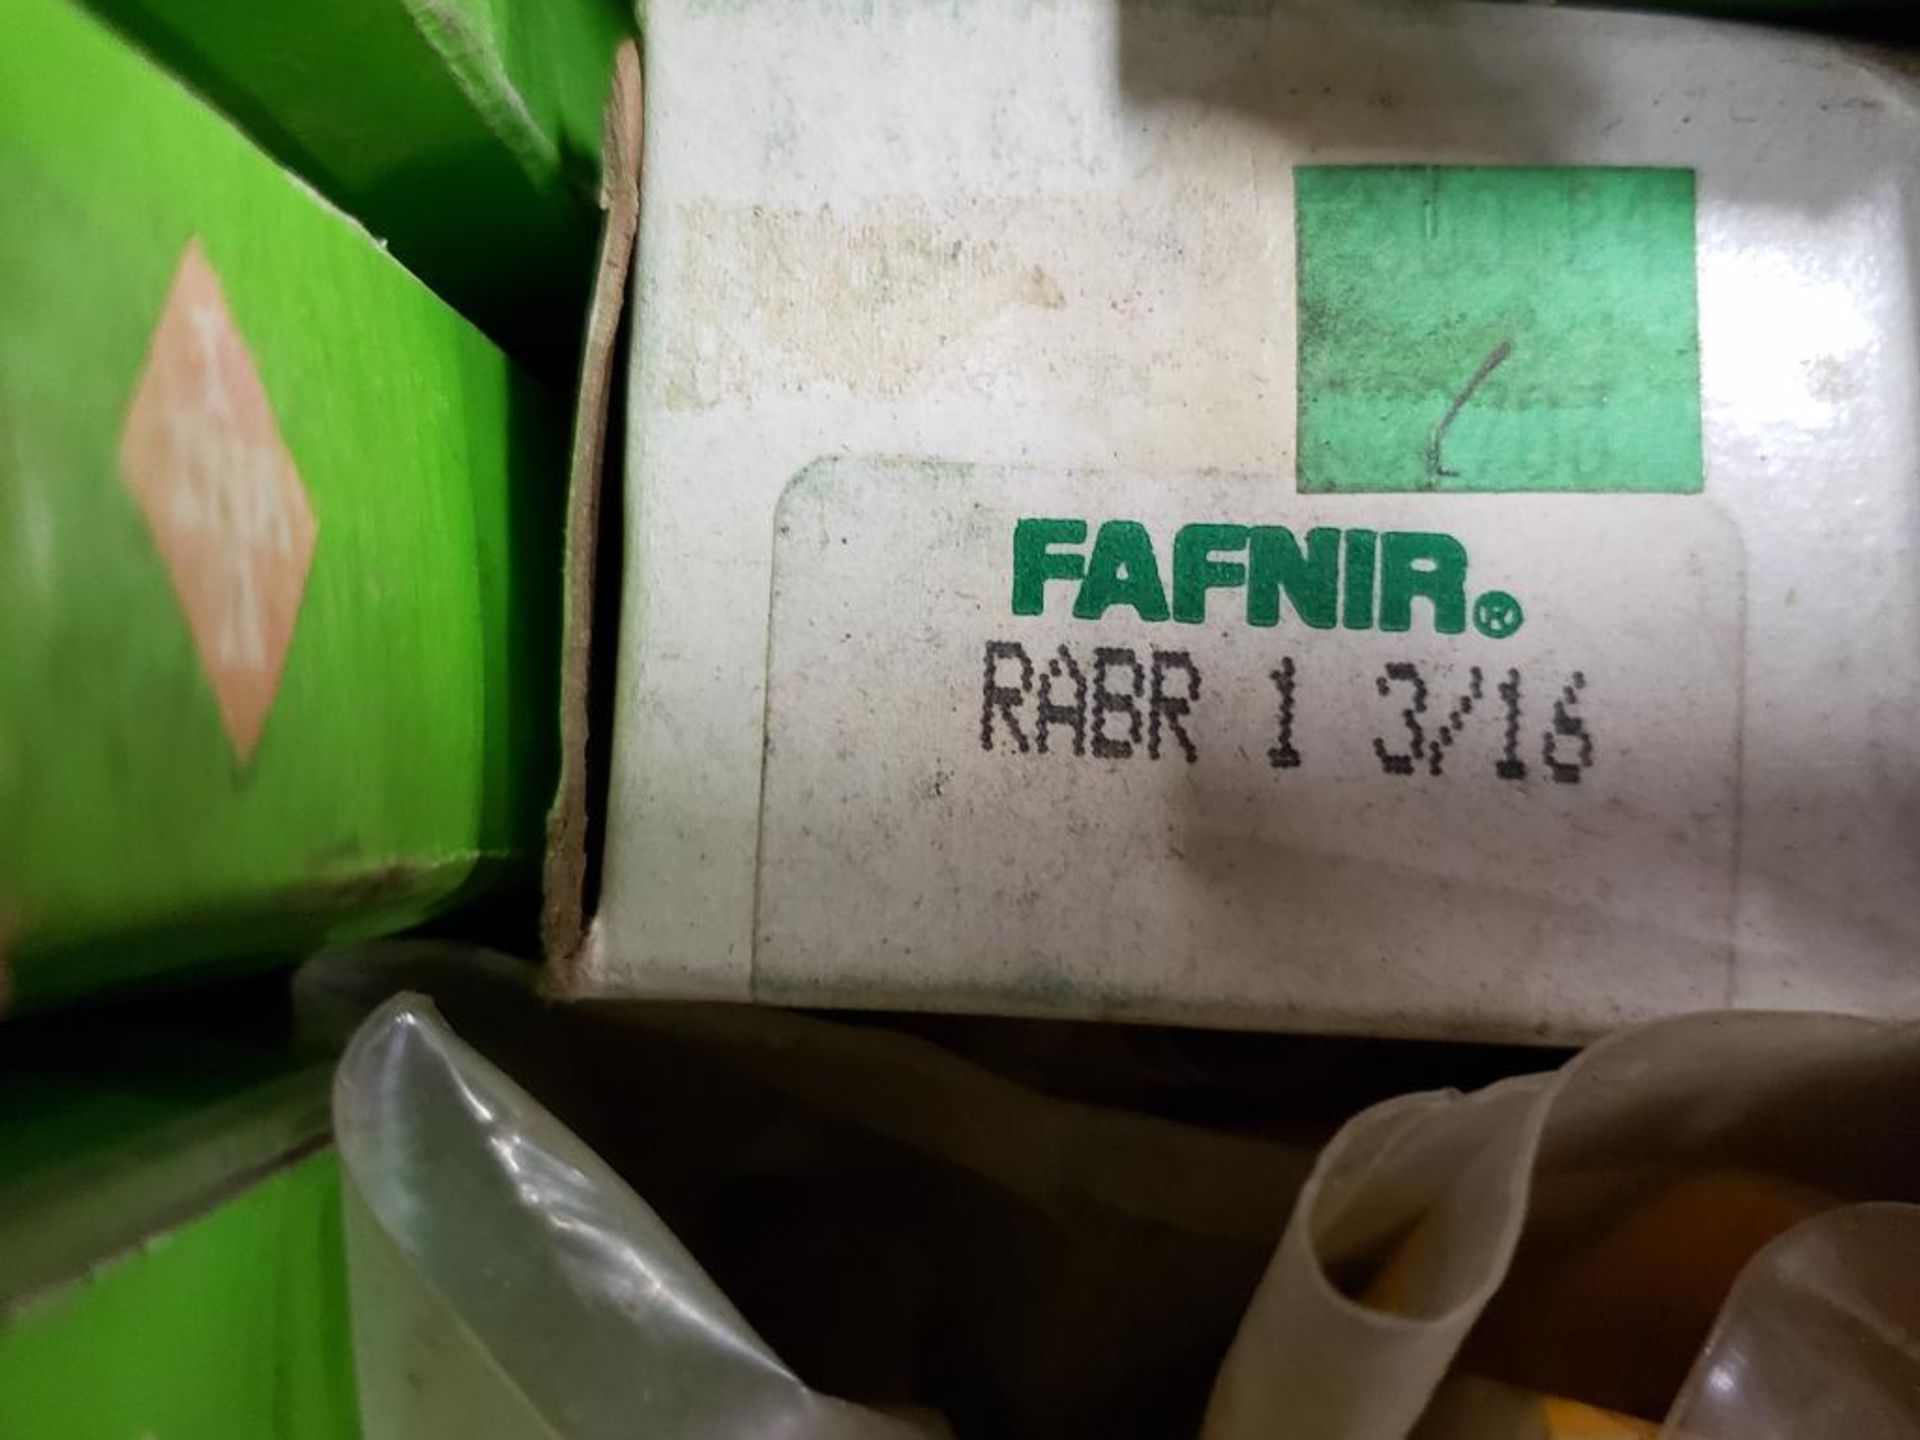 Assorted bearings. INA, Fafnir. - Image 6 of 14